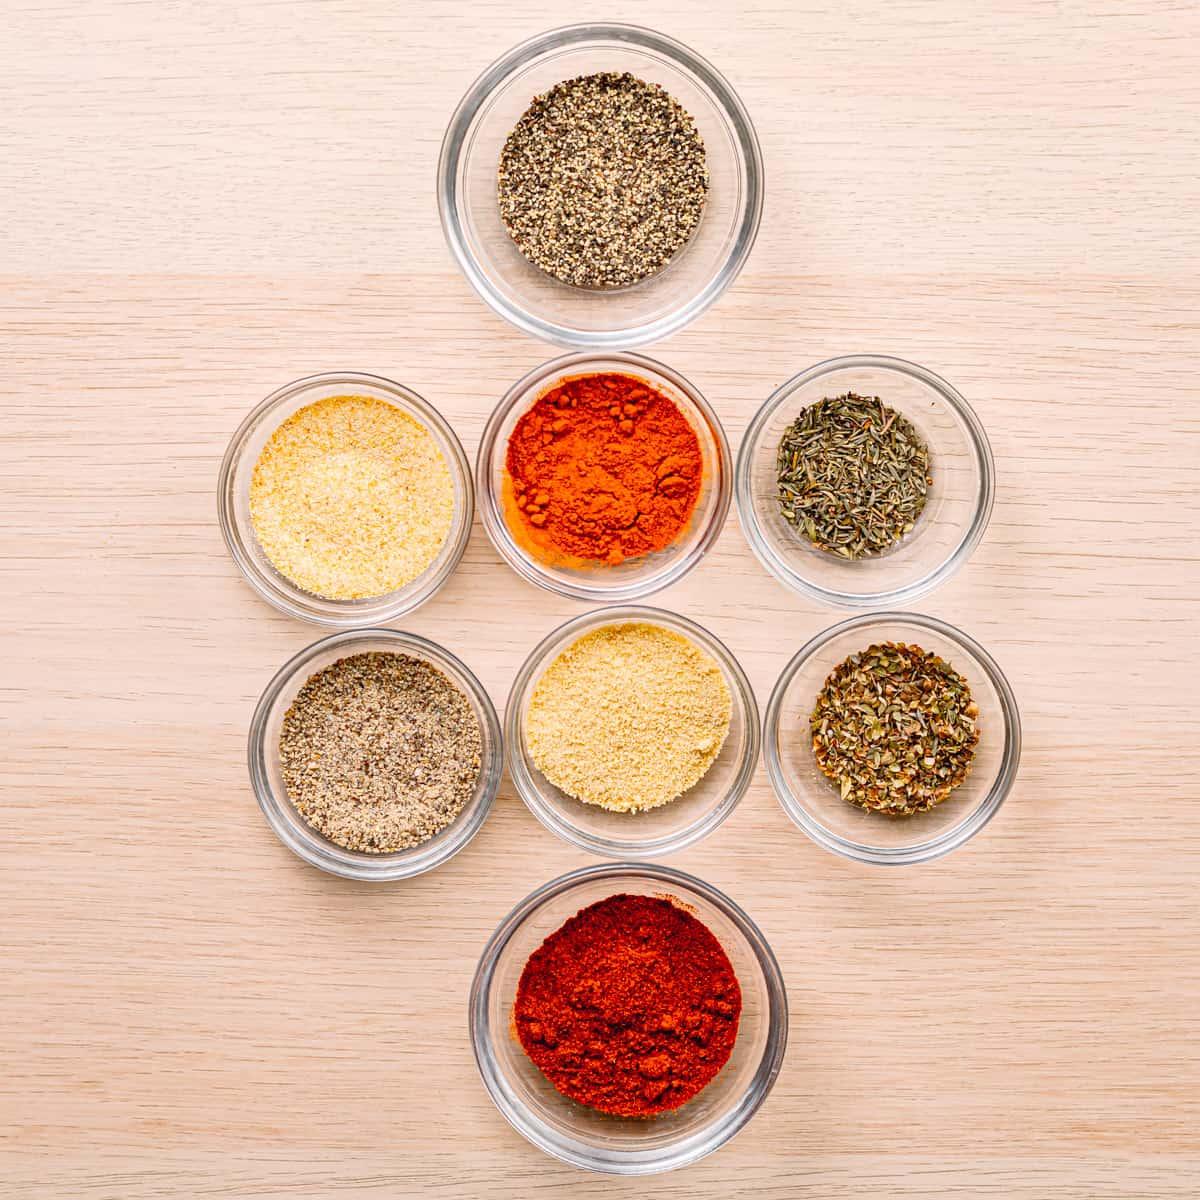 Ingredients for Cajun Spice